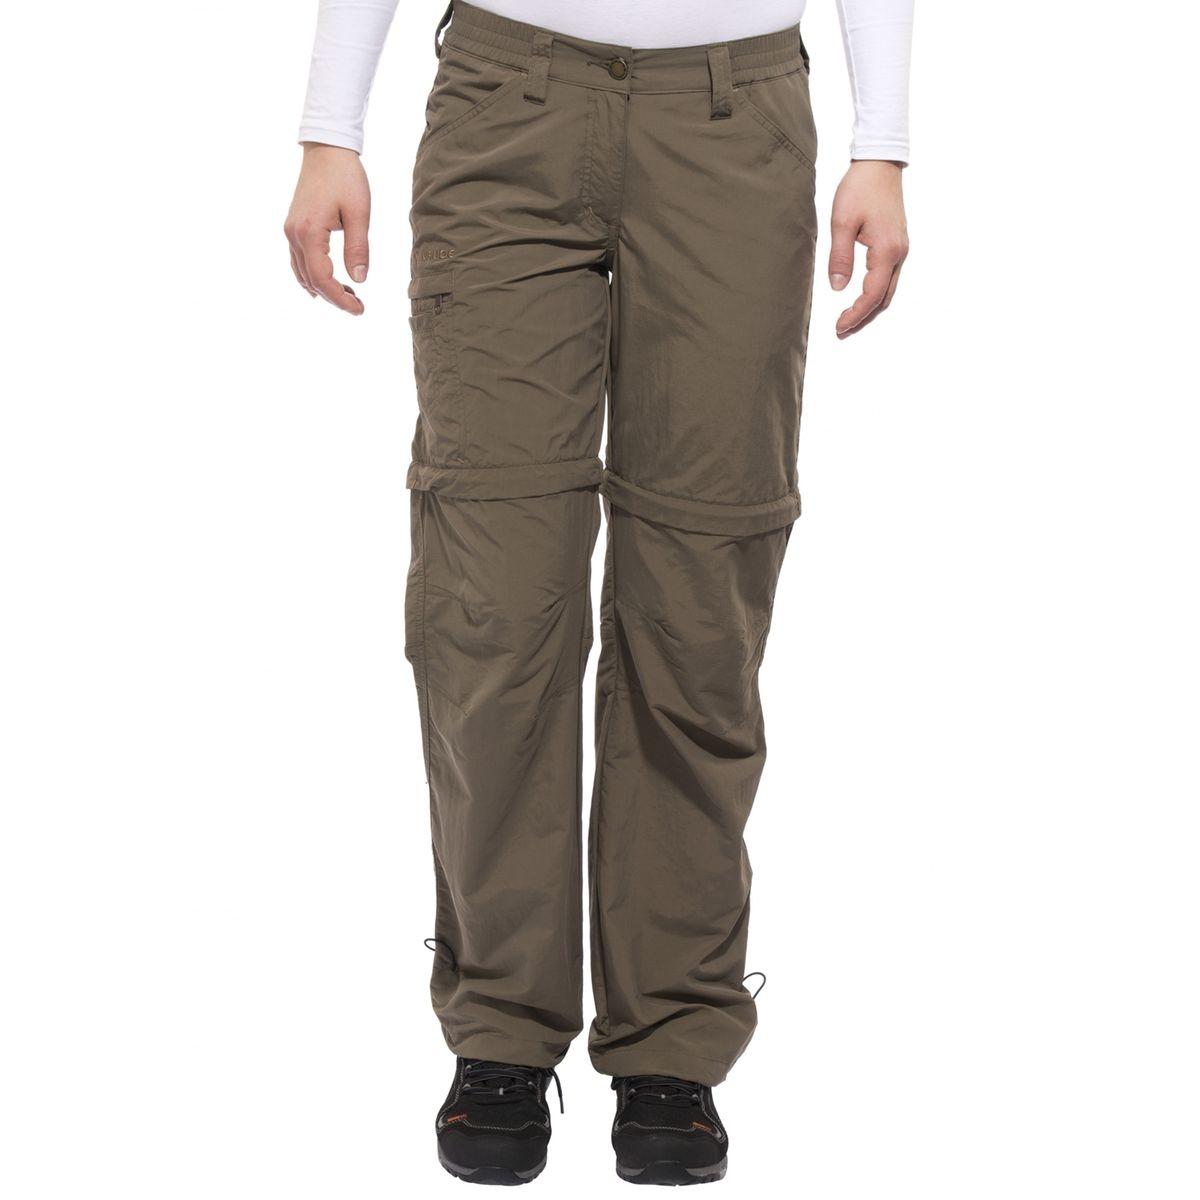 Women's Farley ZO - Pantalon femme - Olive